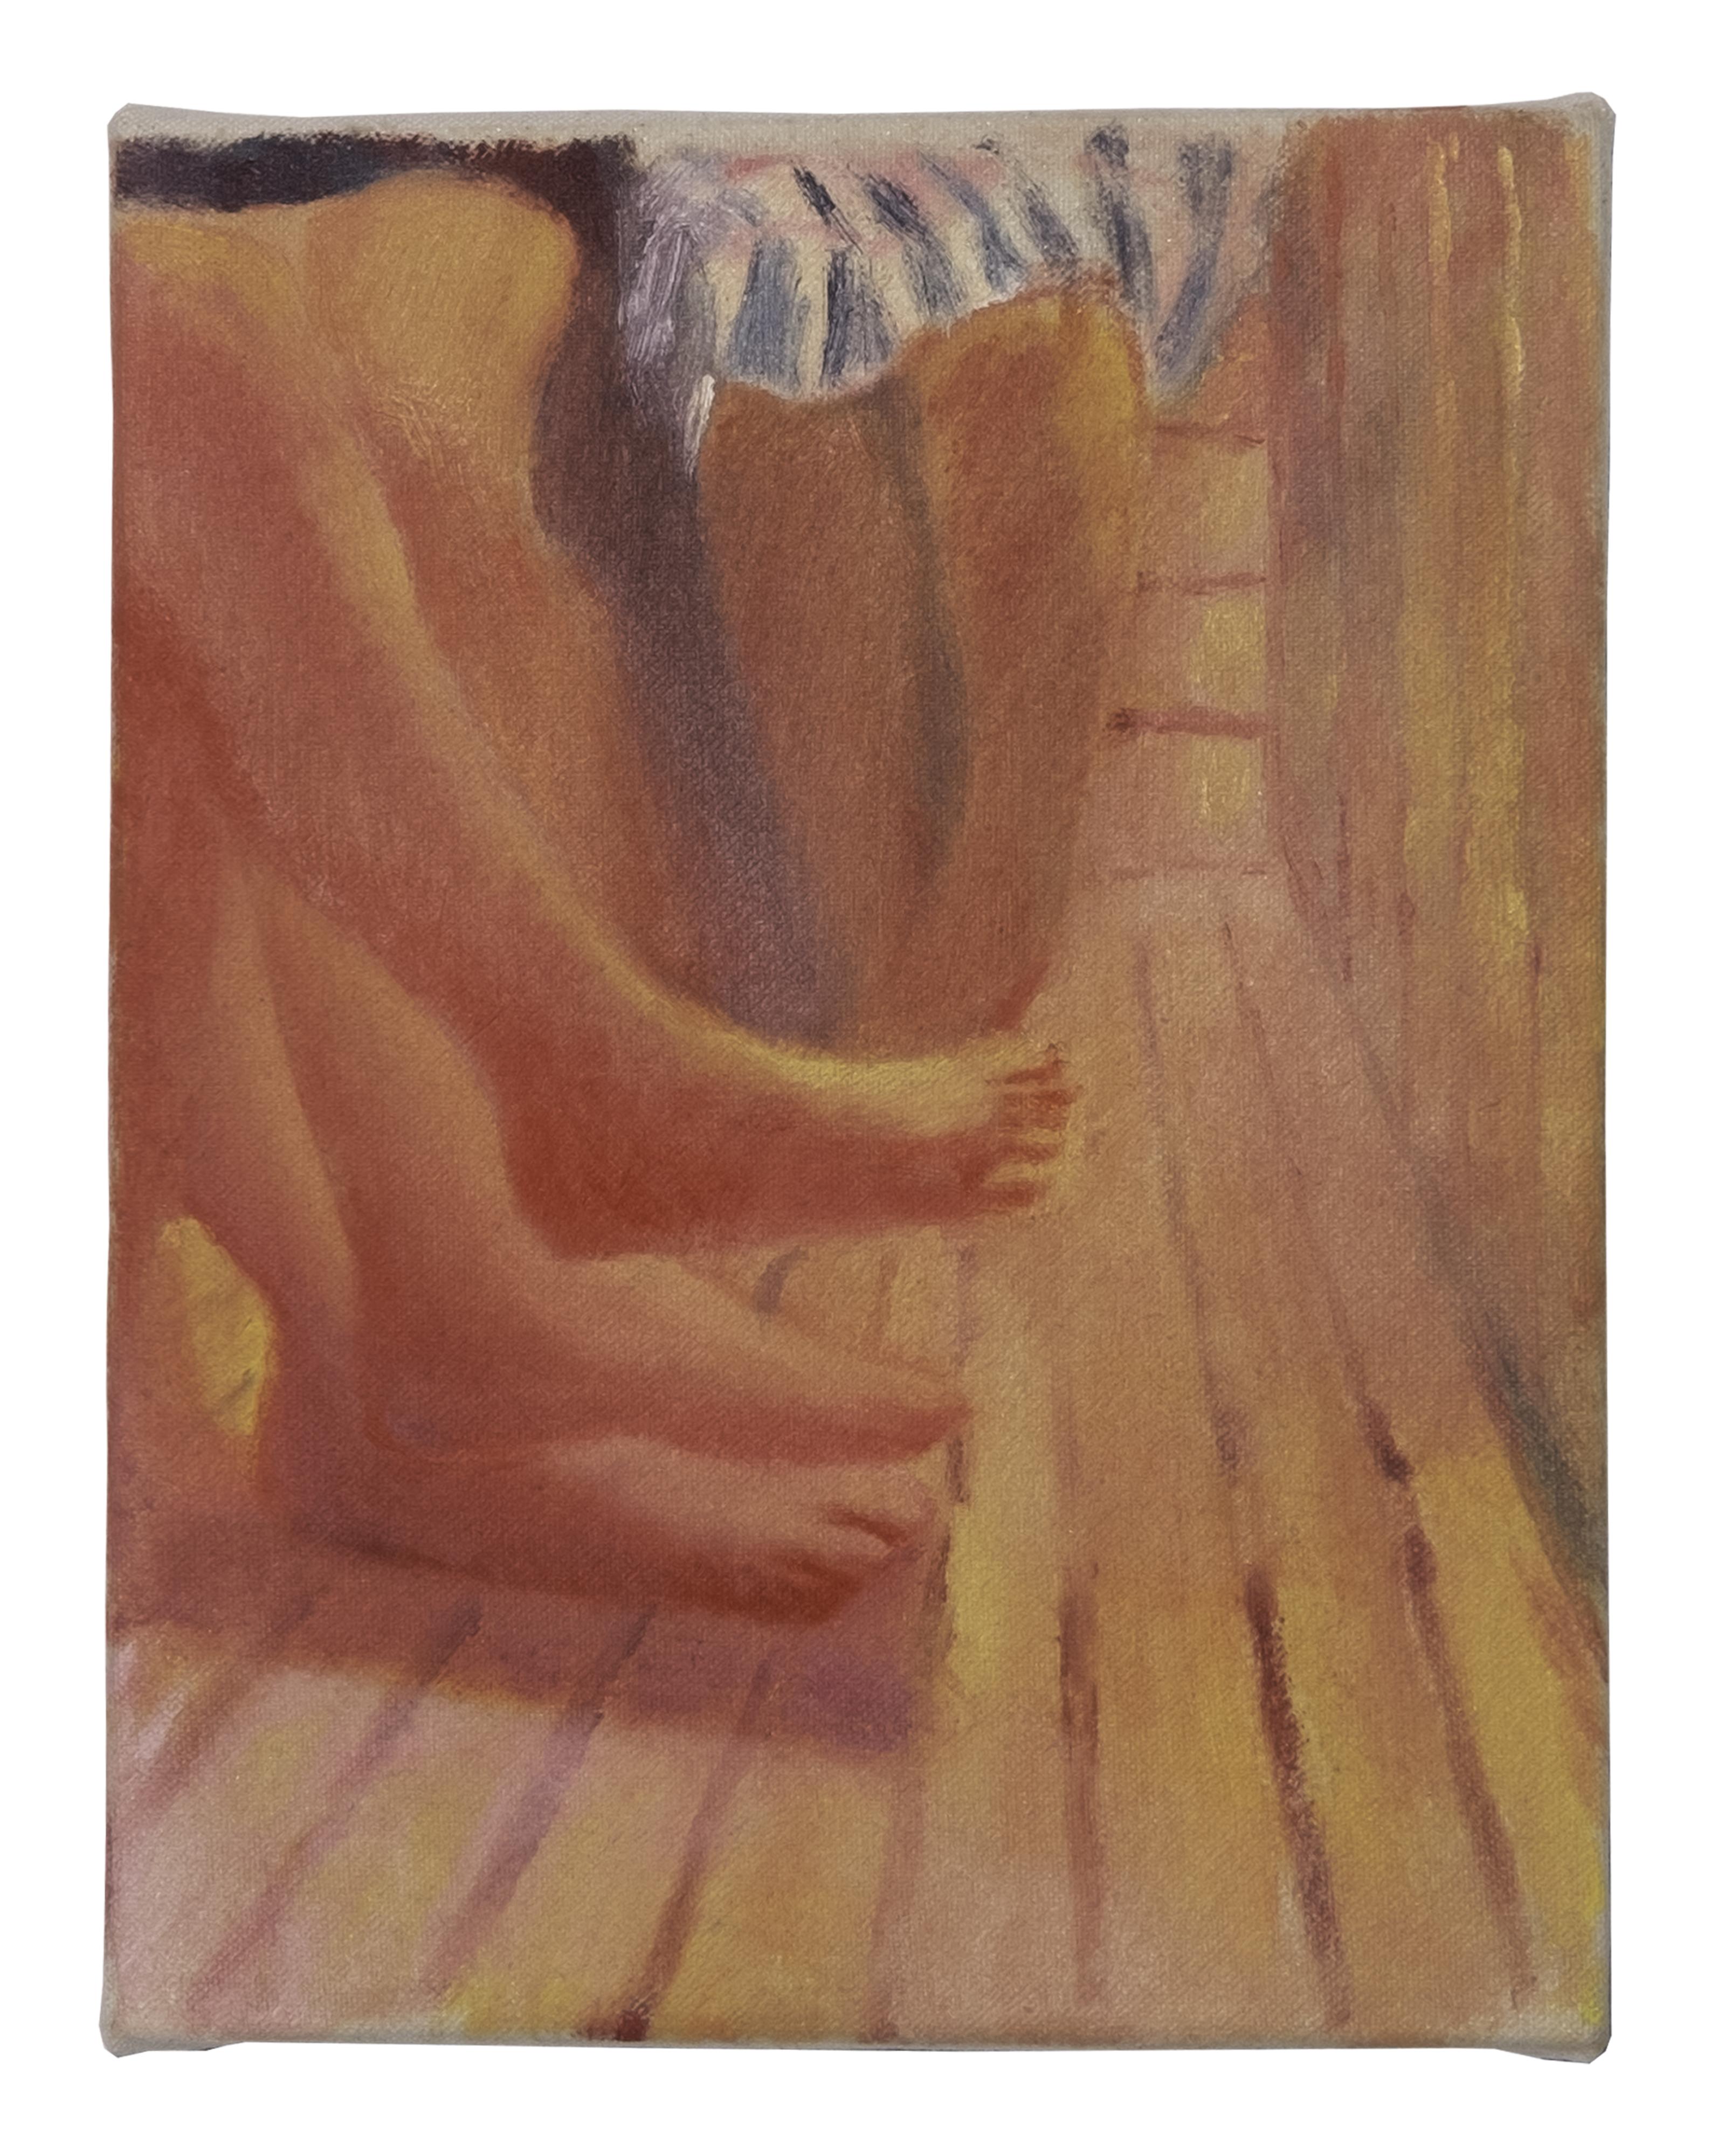 Feet In The Sauna